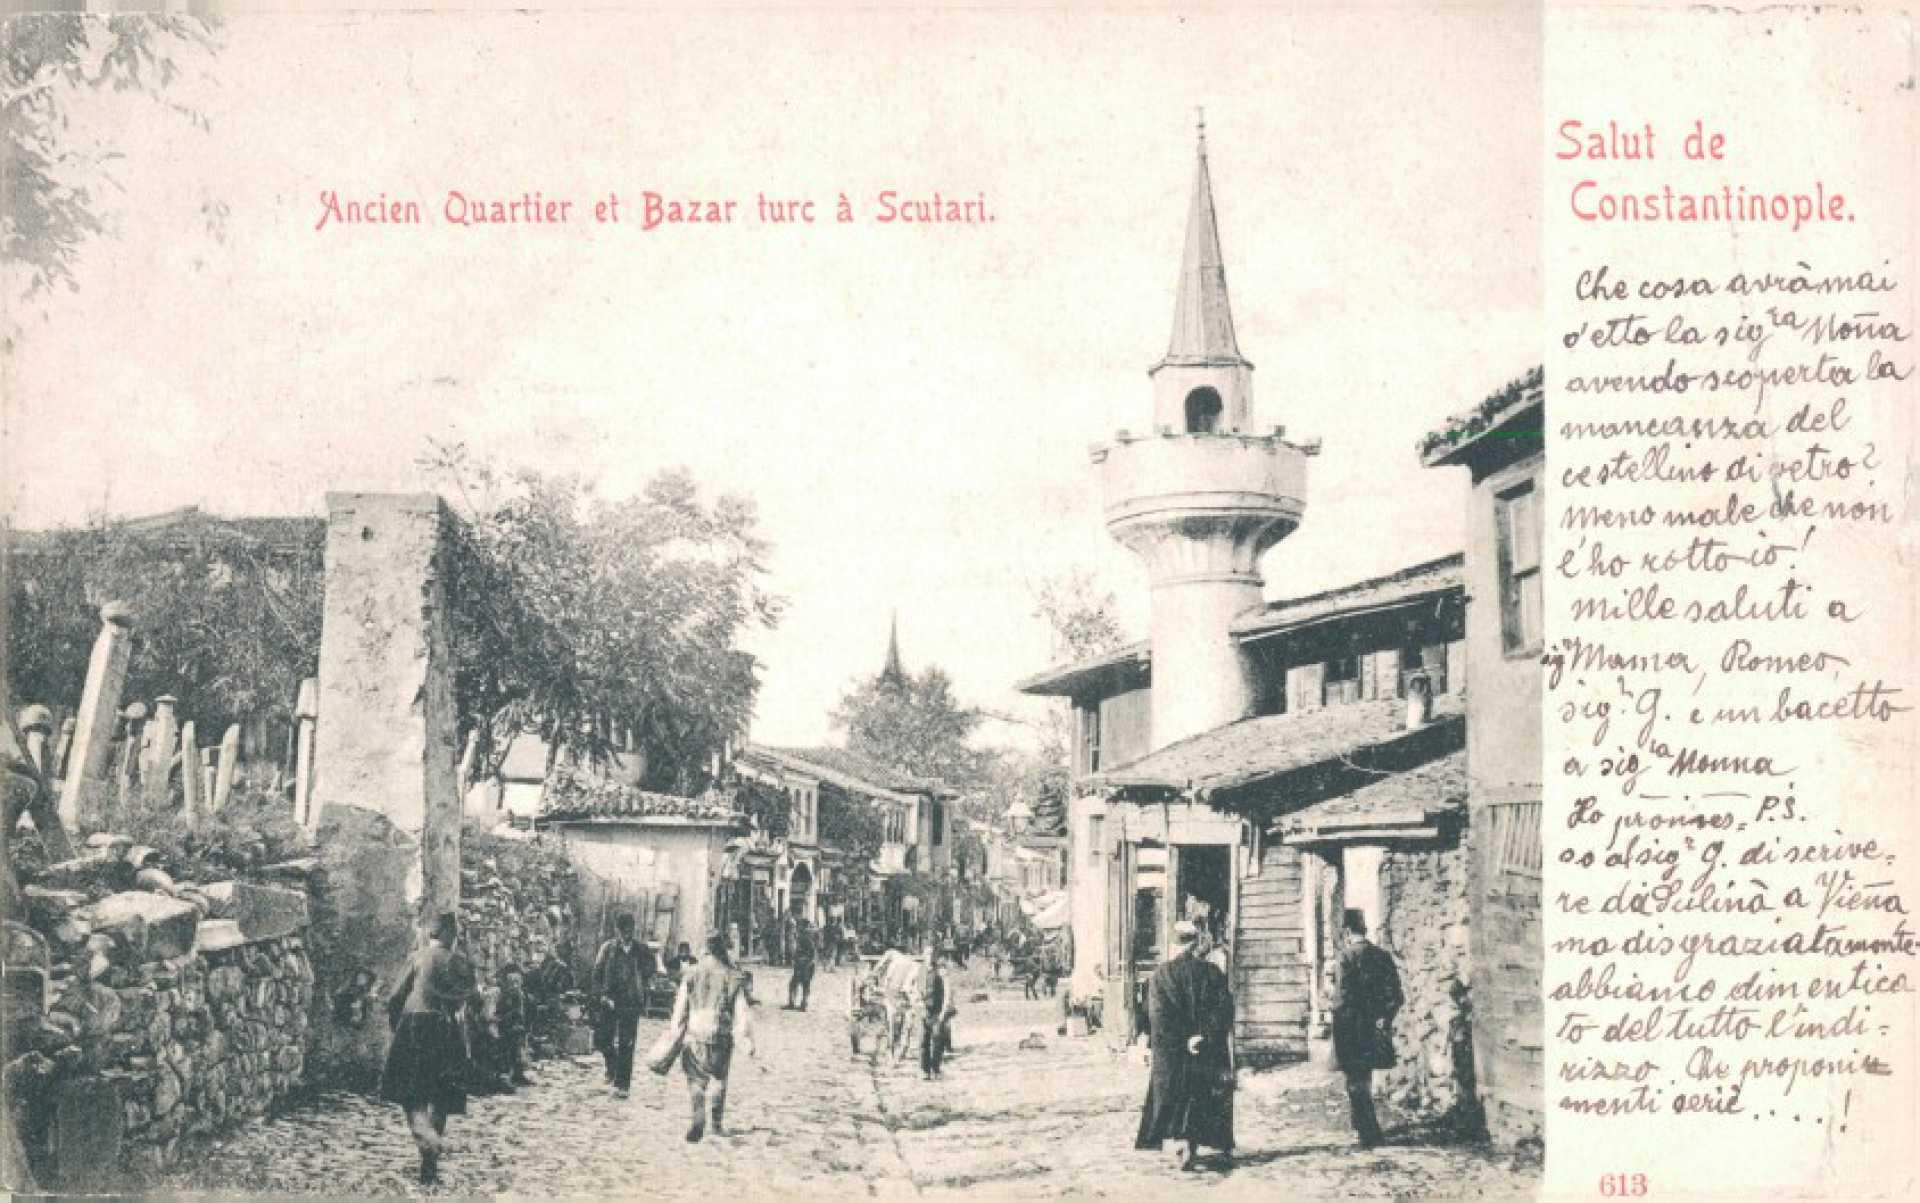 Ancien quartier et bazar turc a Scutari